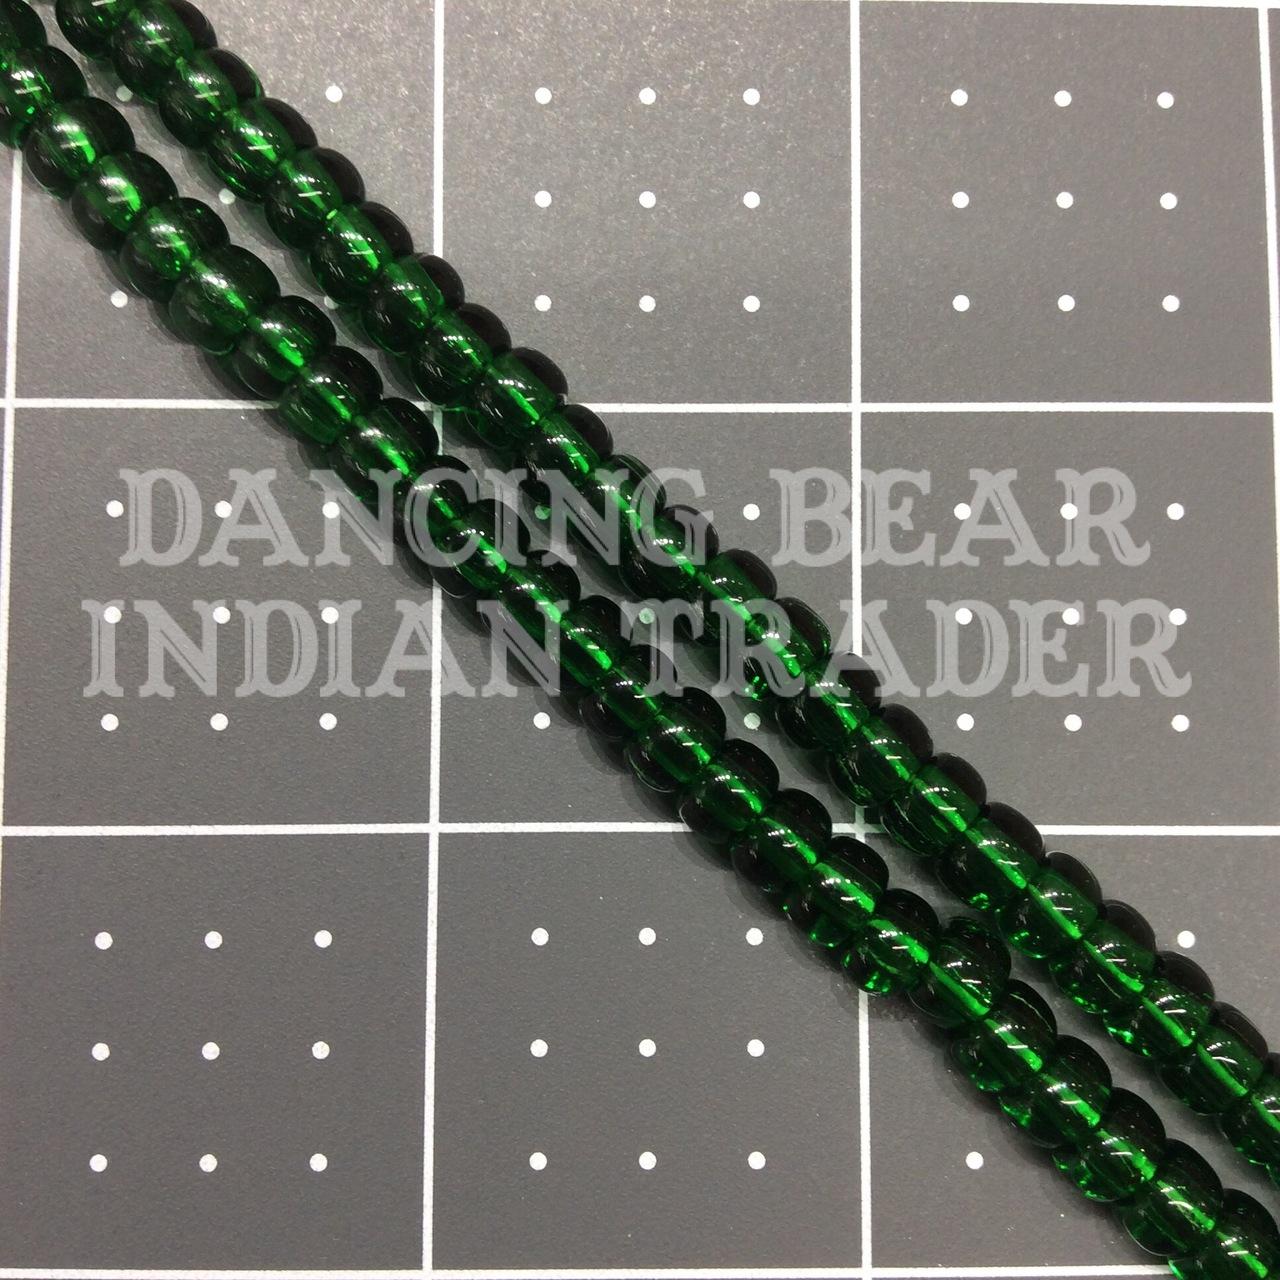 1/0-213TR Dk Xmas Green